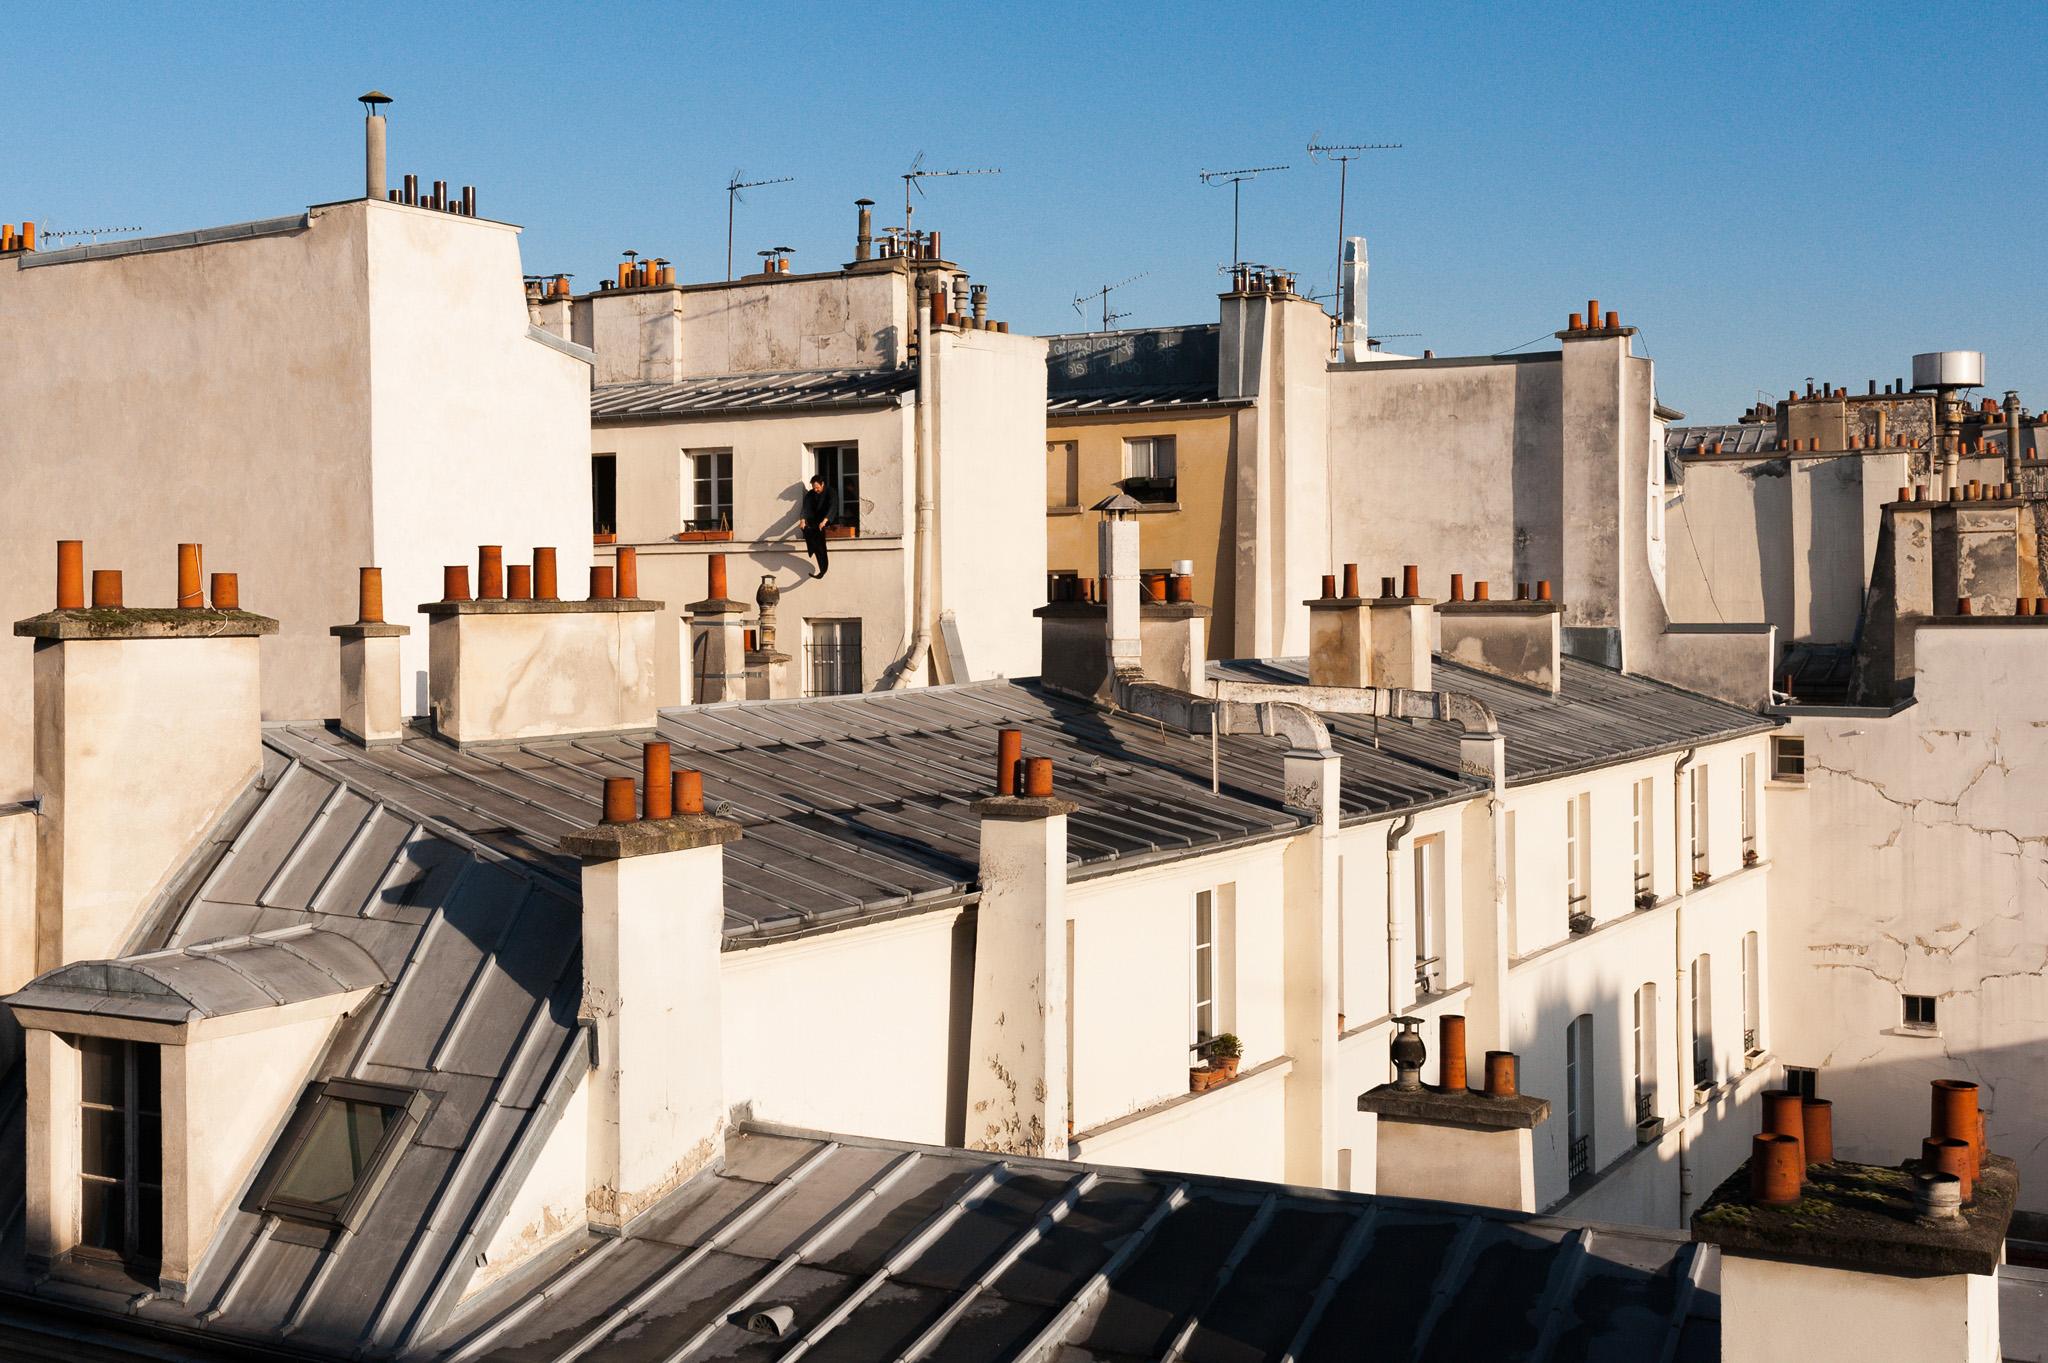 Paris - Daniel Purvis - TRB_8147.jpg